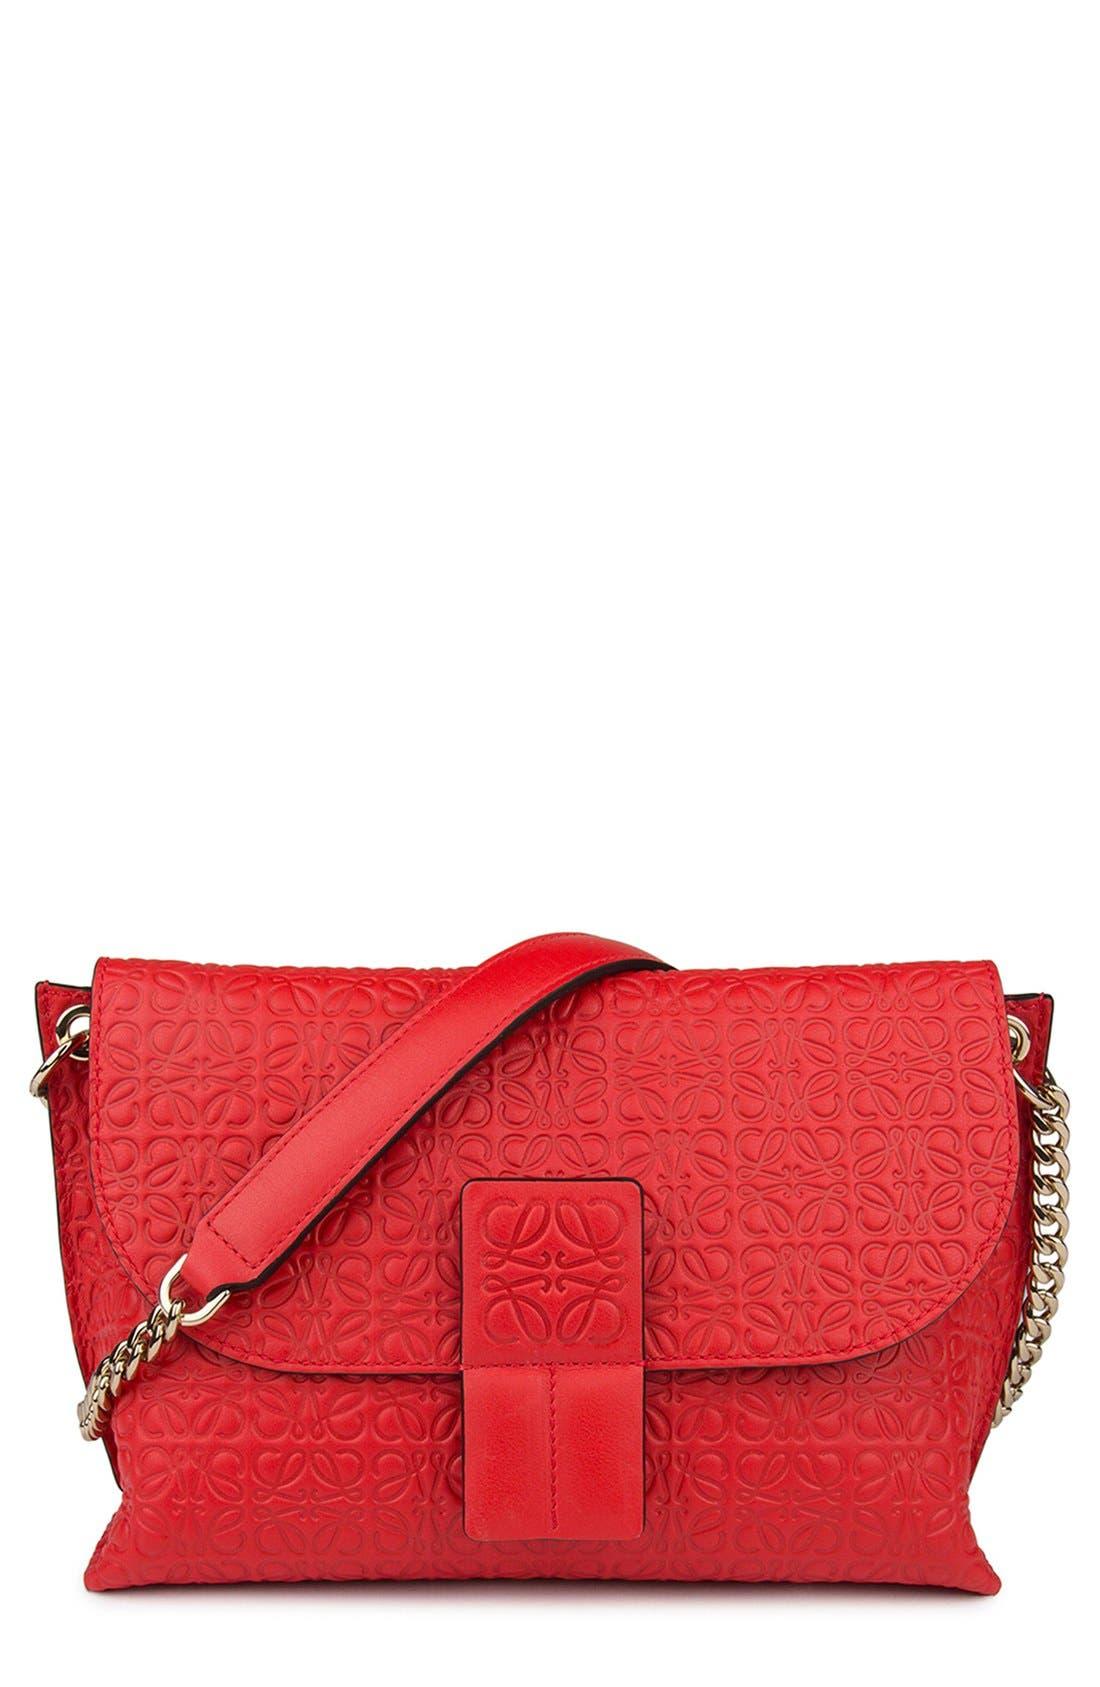 Main Image - Loewe 'Avenue' Embossed Calfskin Leather Crossbody Bag